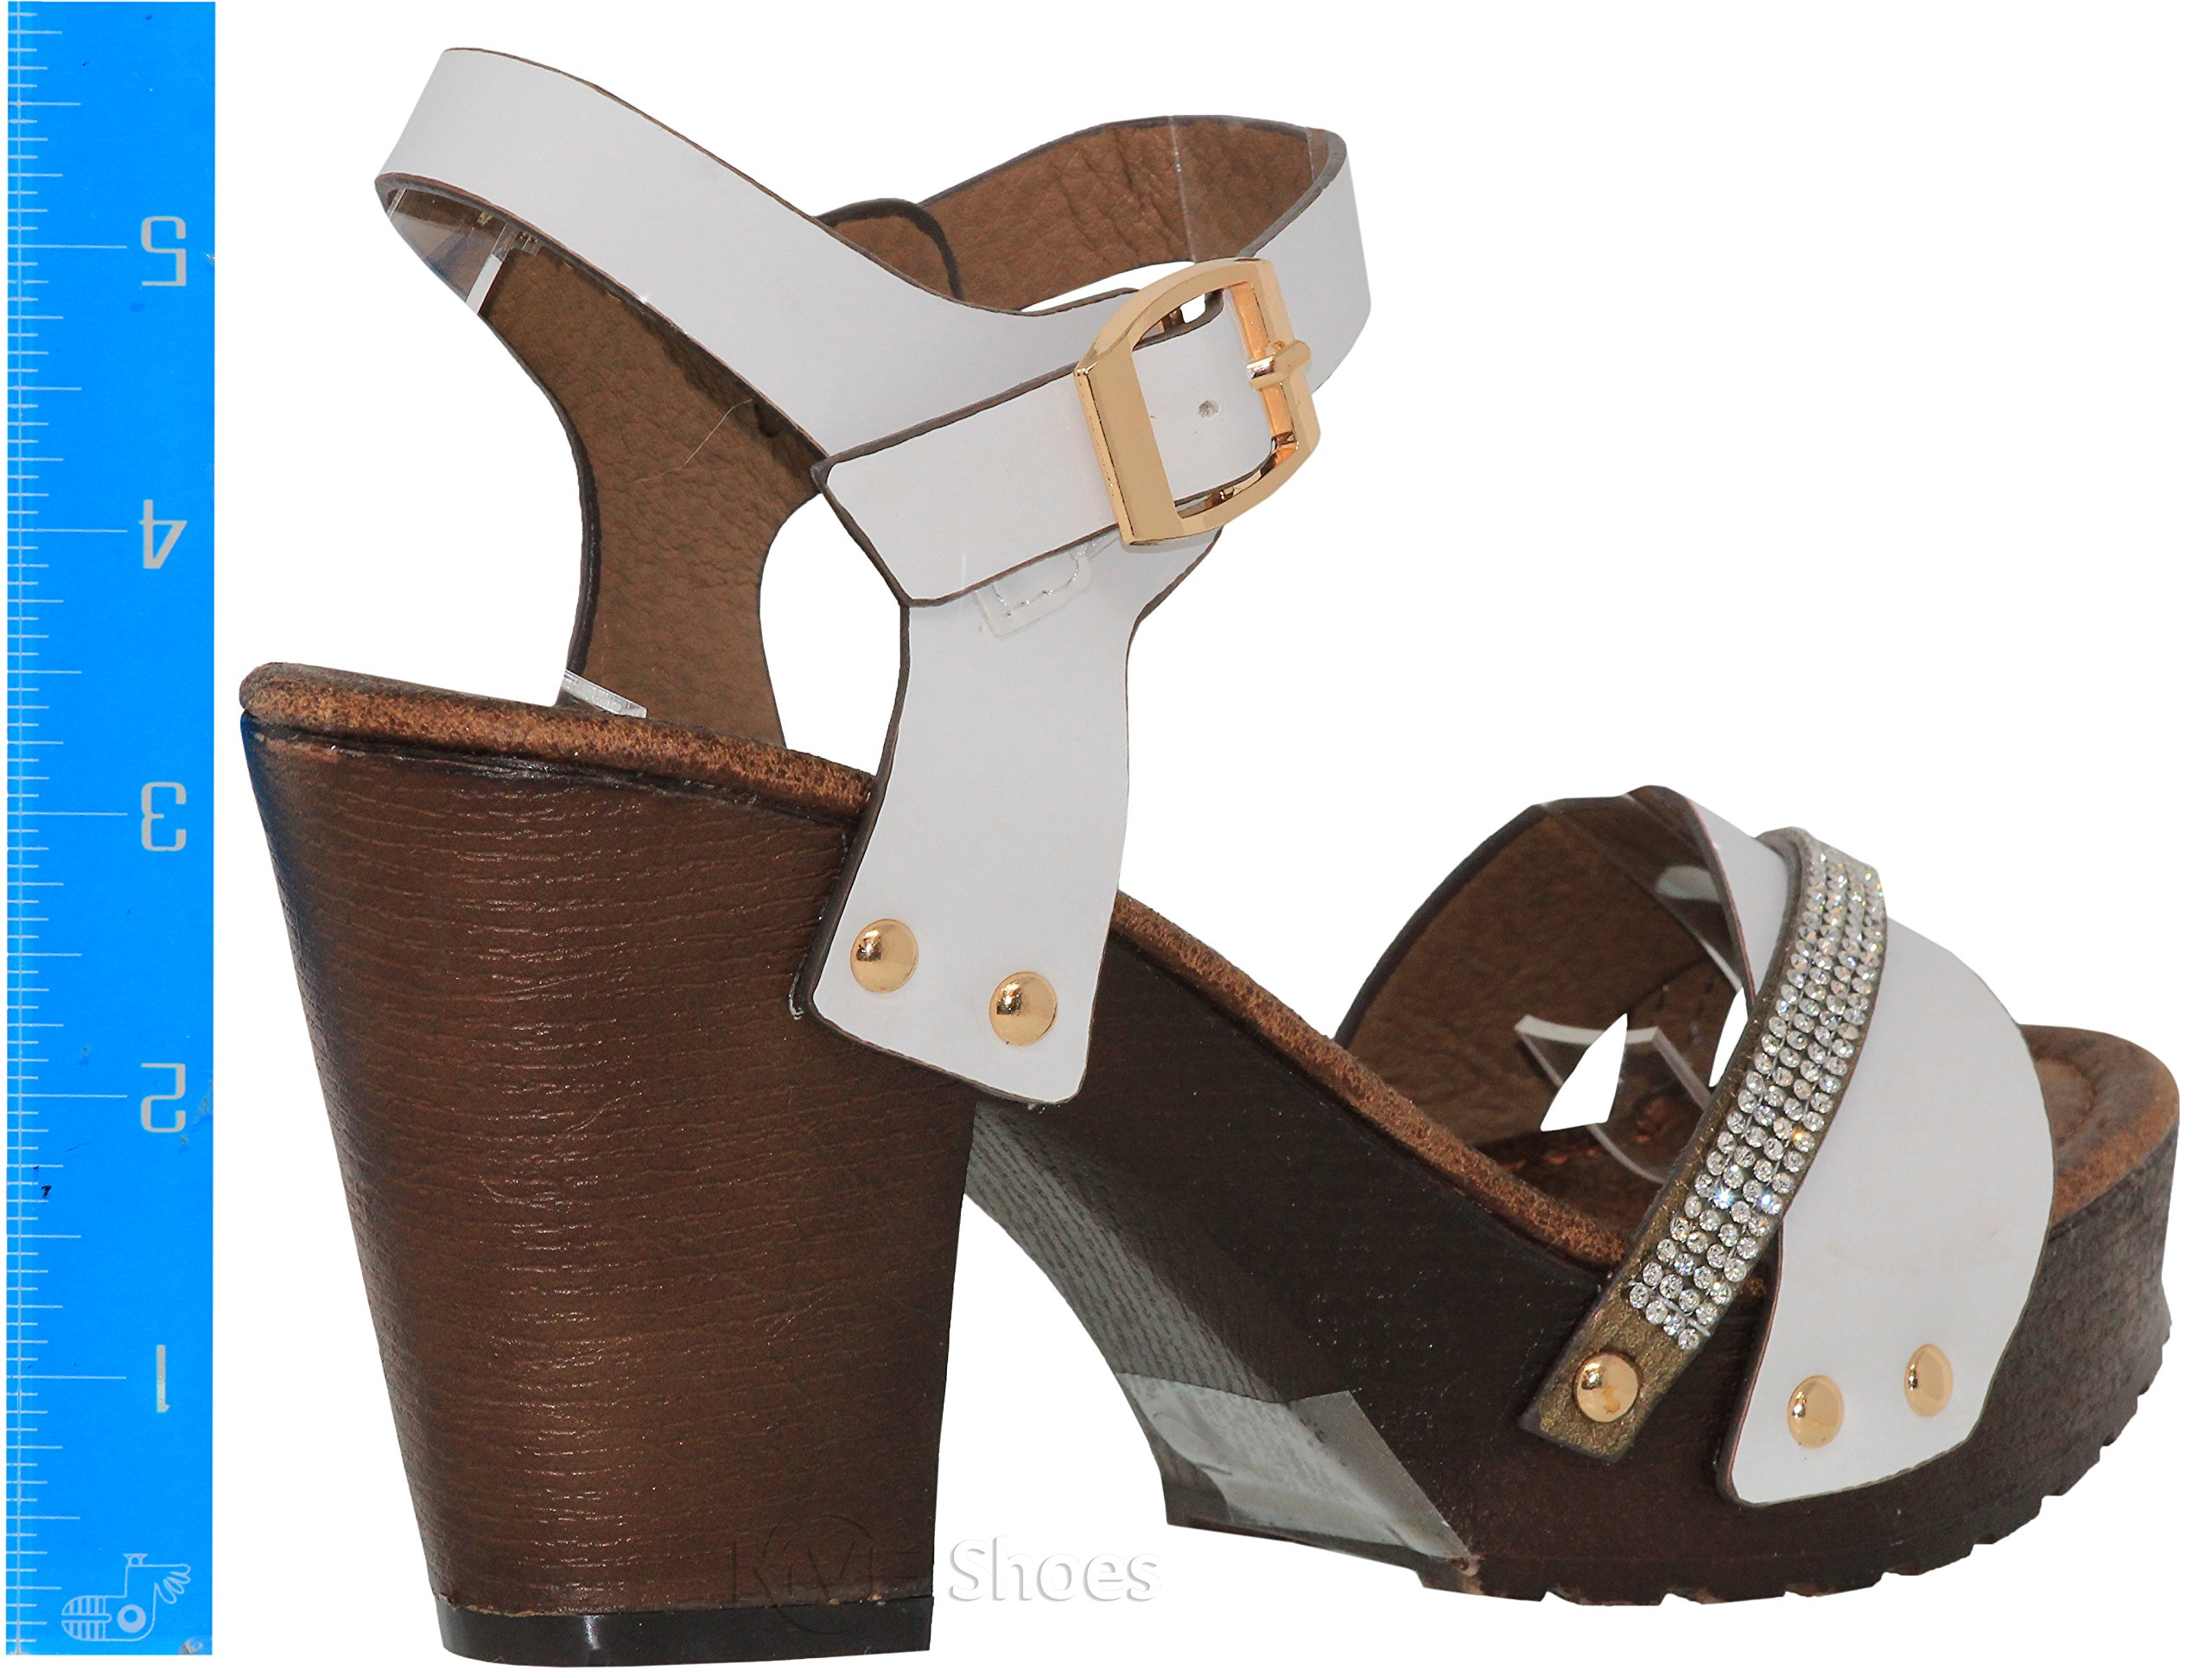 MVE Shoes Women's Ankle Strap Faux Wood Platform Chunky Heel Sandal,vint-02 White pu 10 by MVE Shoes (Image #3)